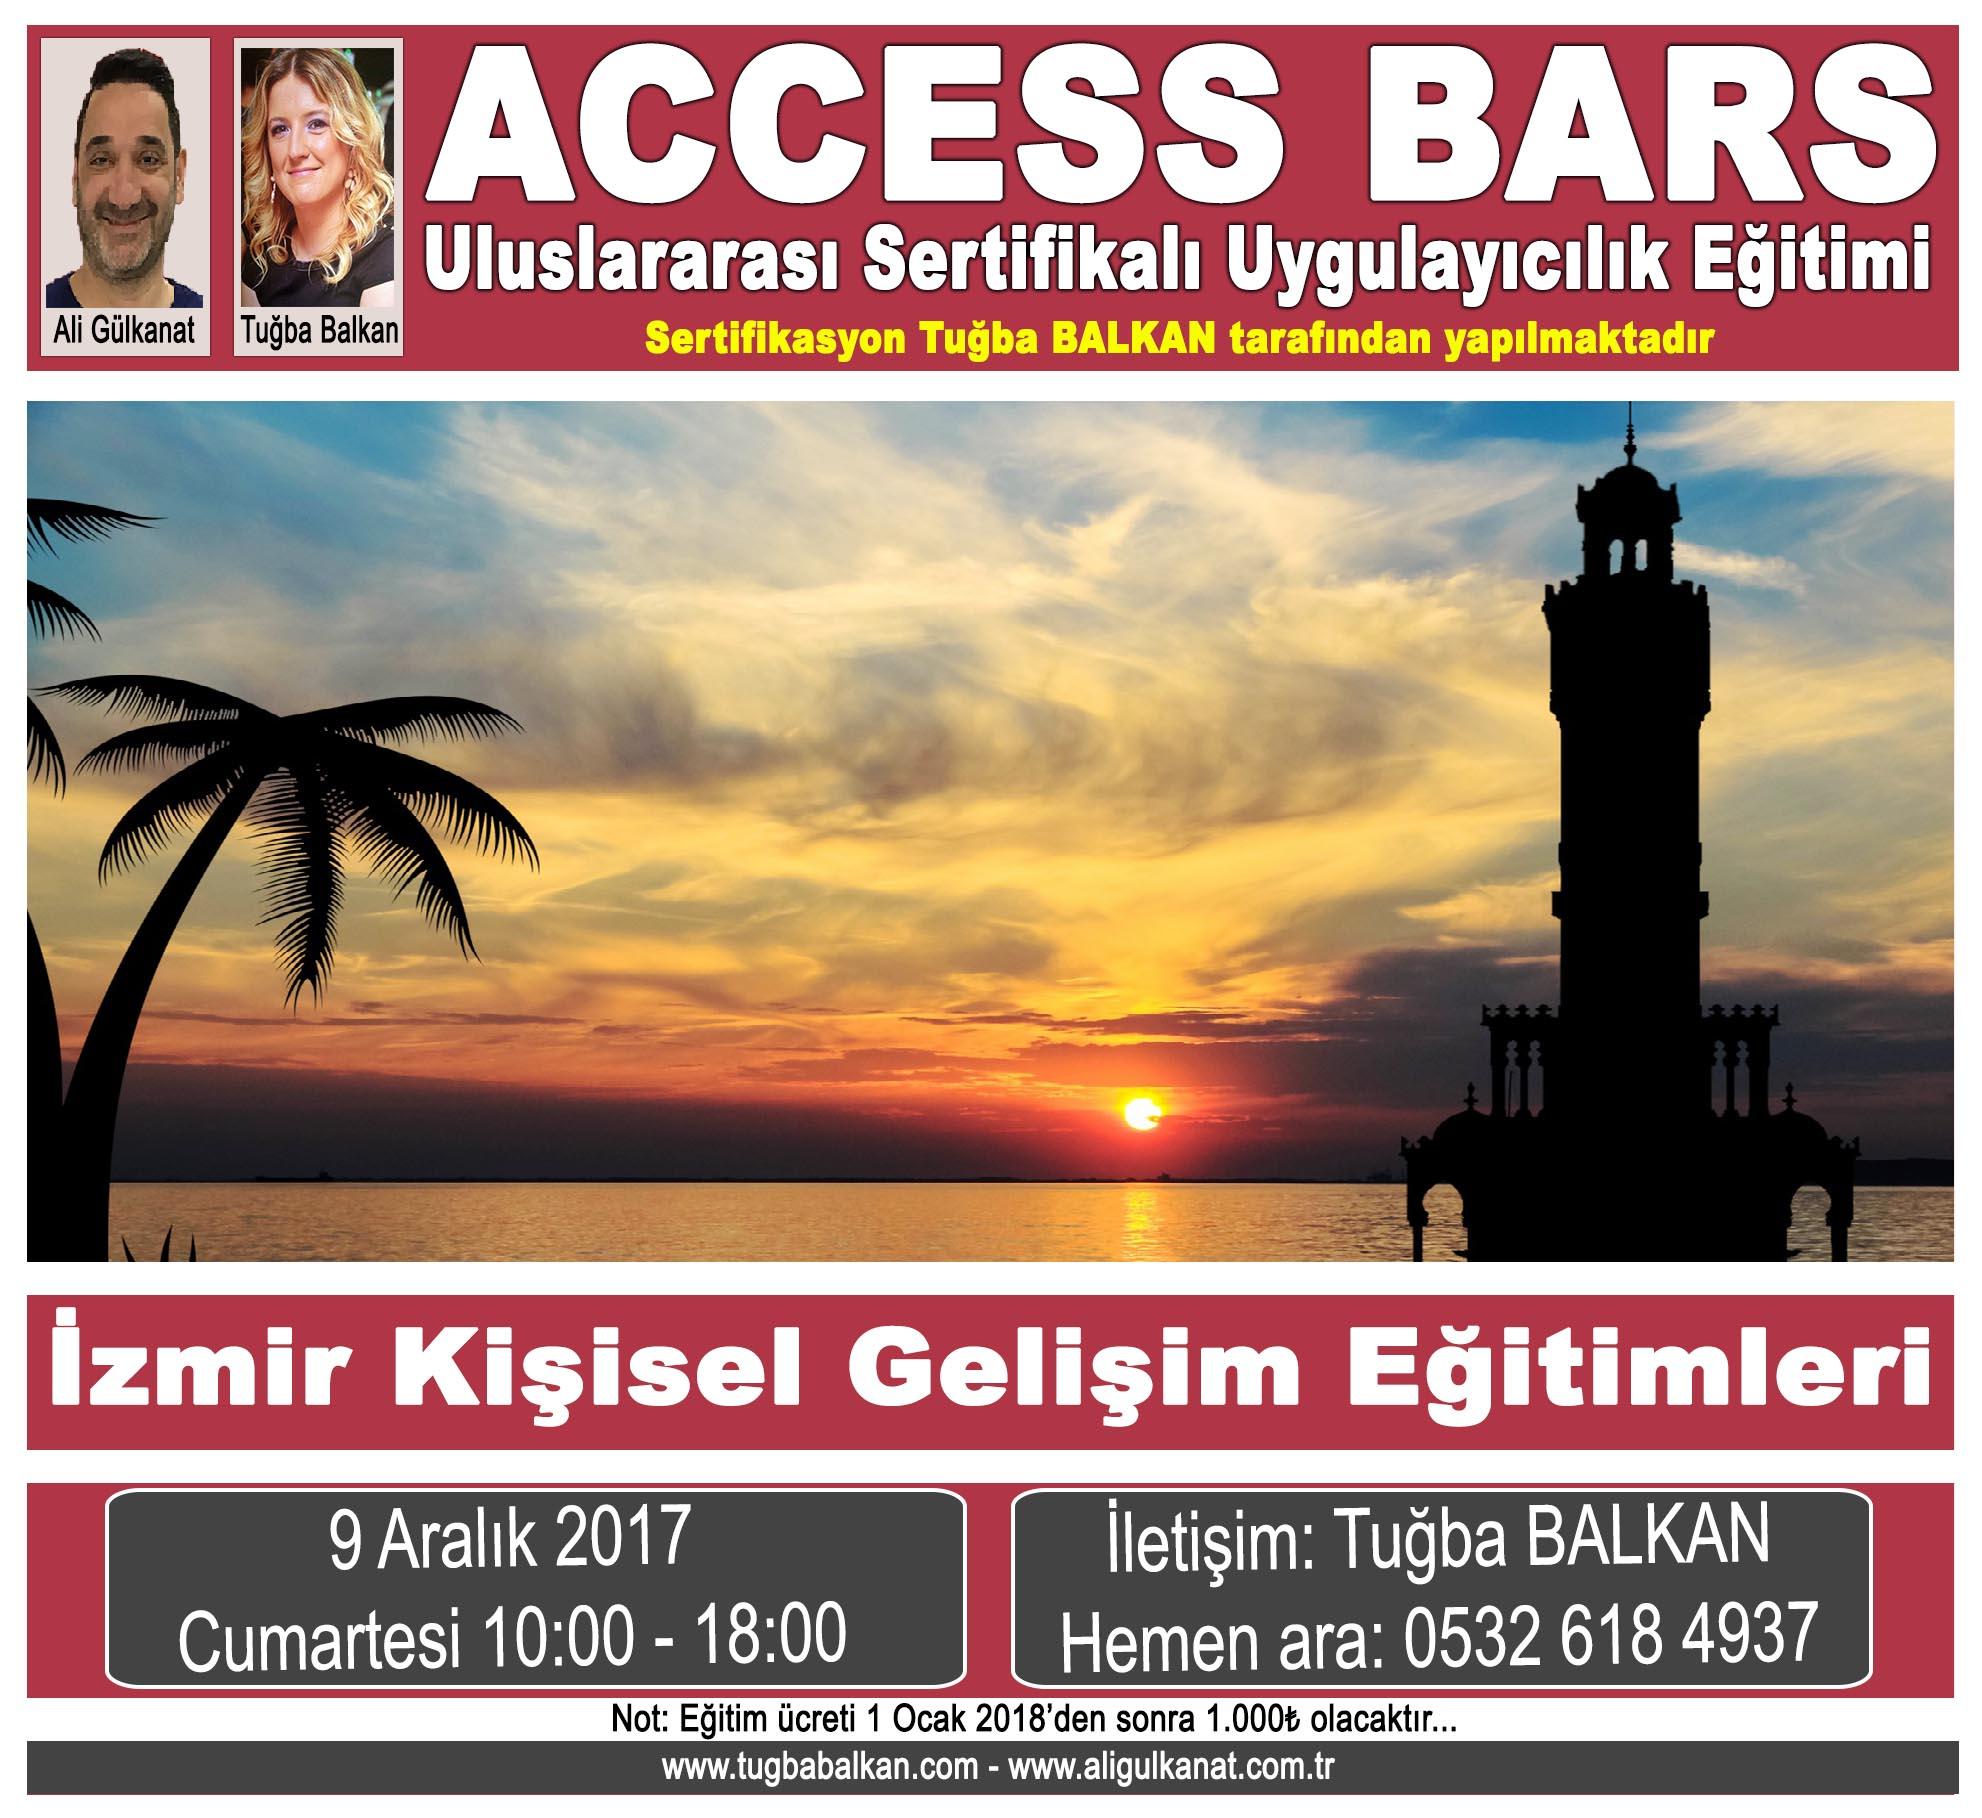 access-bars-tanitim-9-aralik-1